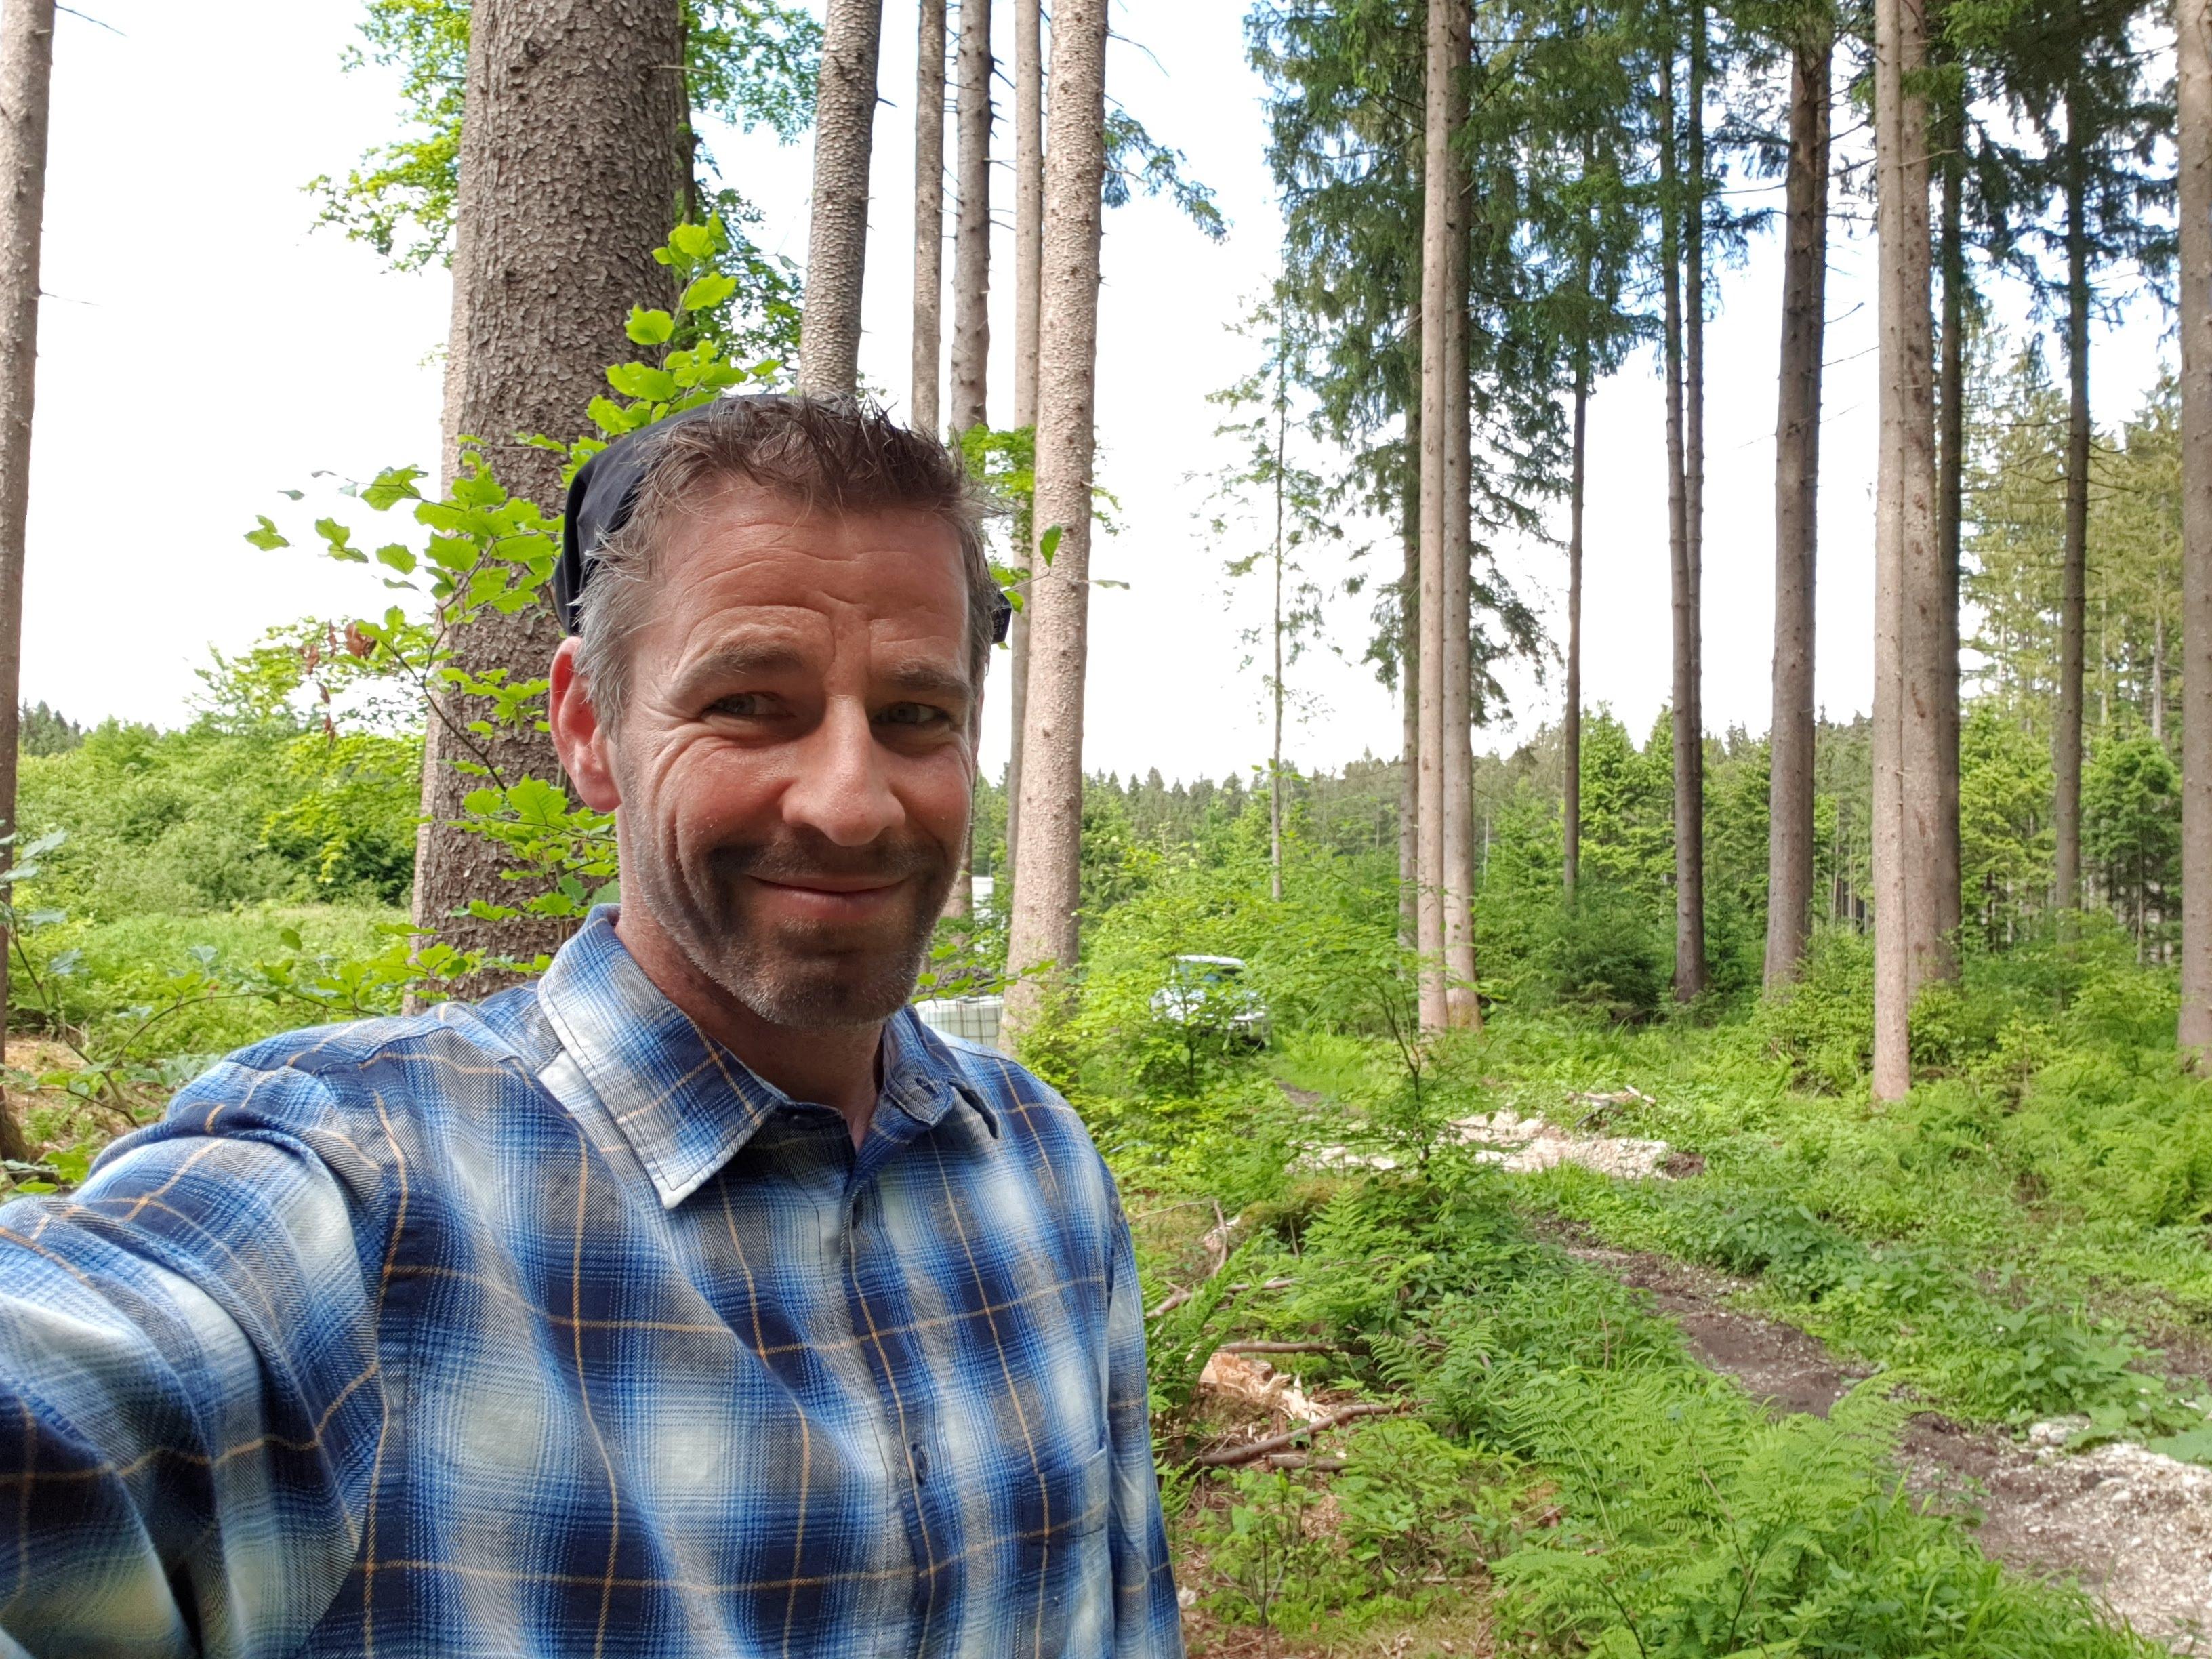 Stuntdouble Wayne Carpendale - Soko München